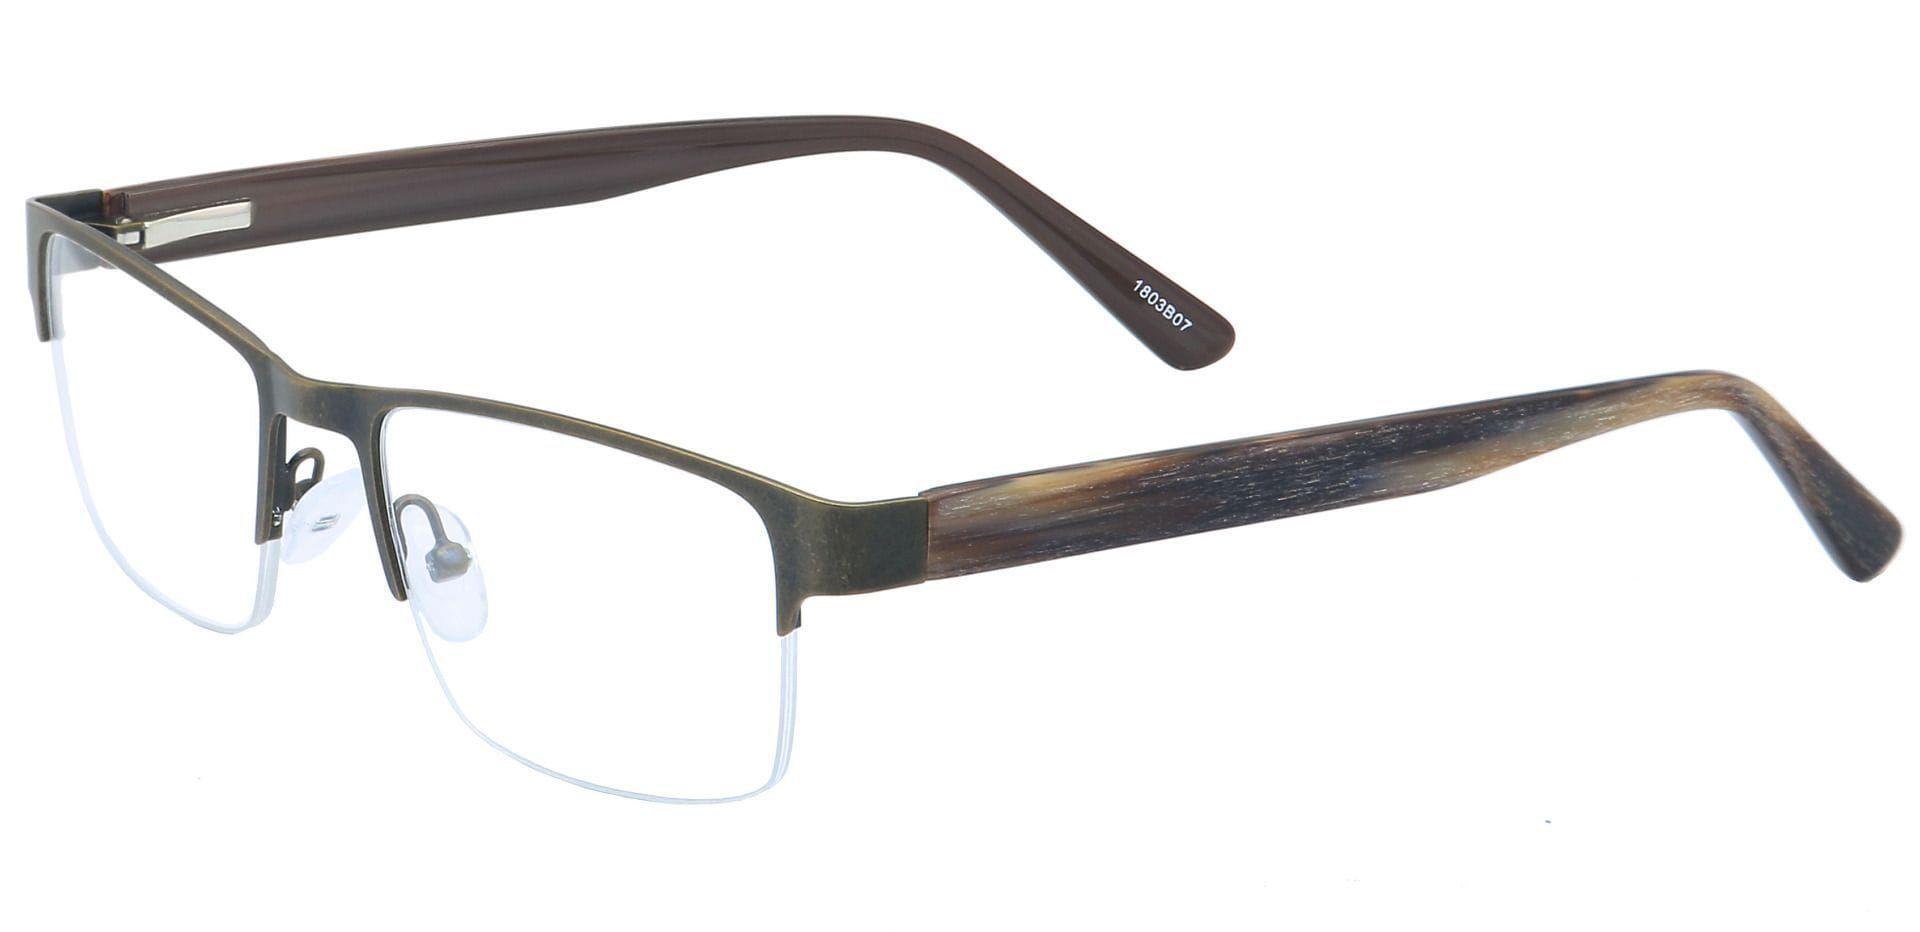 Midnight Square Eyeglasses Frame - Brown